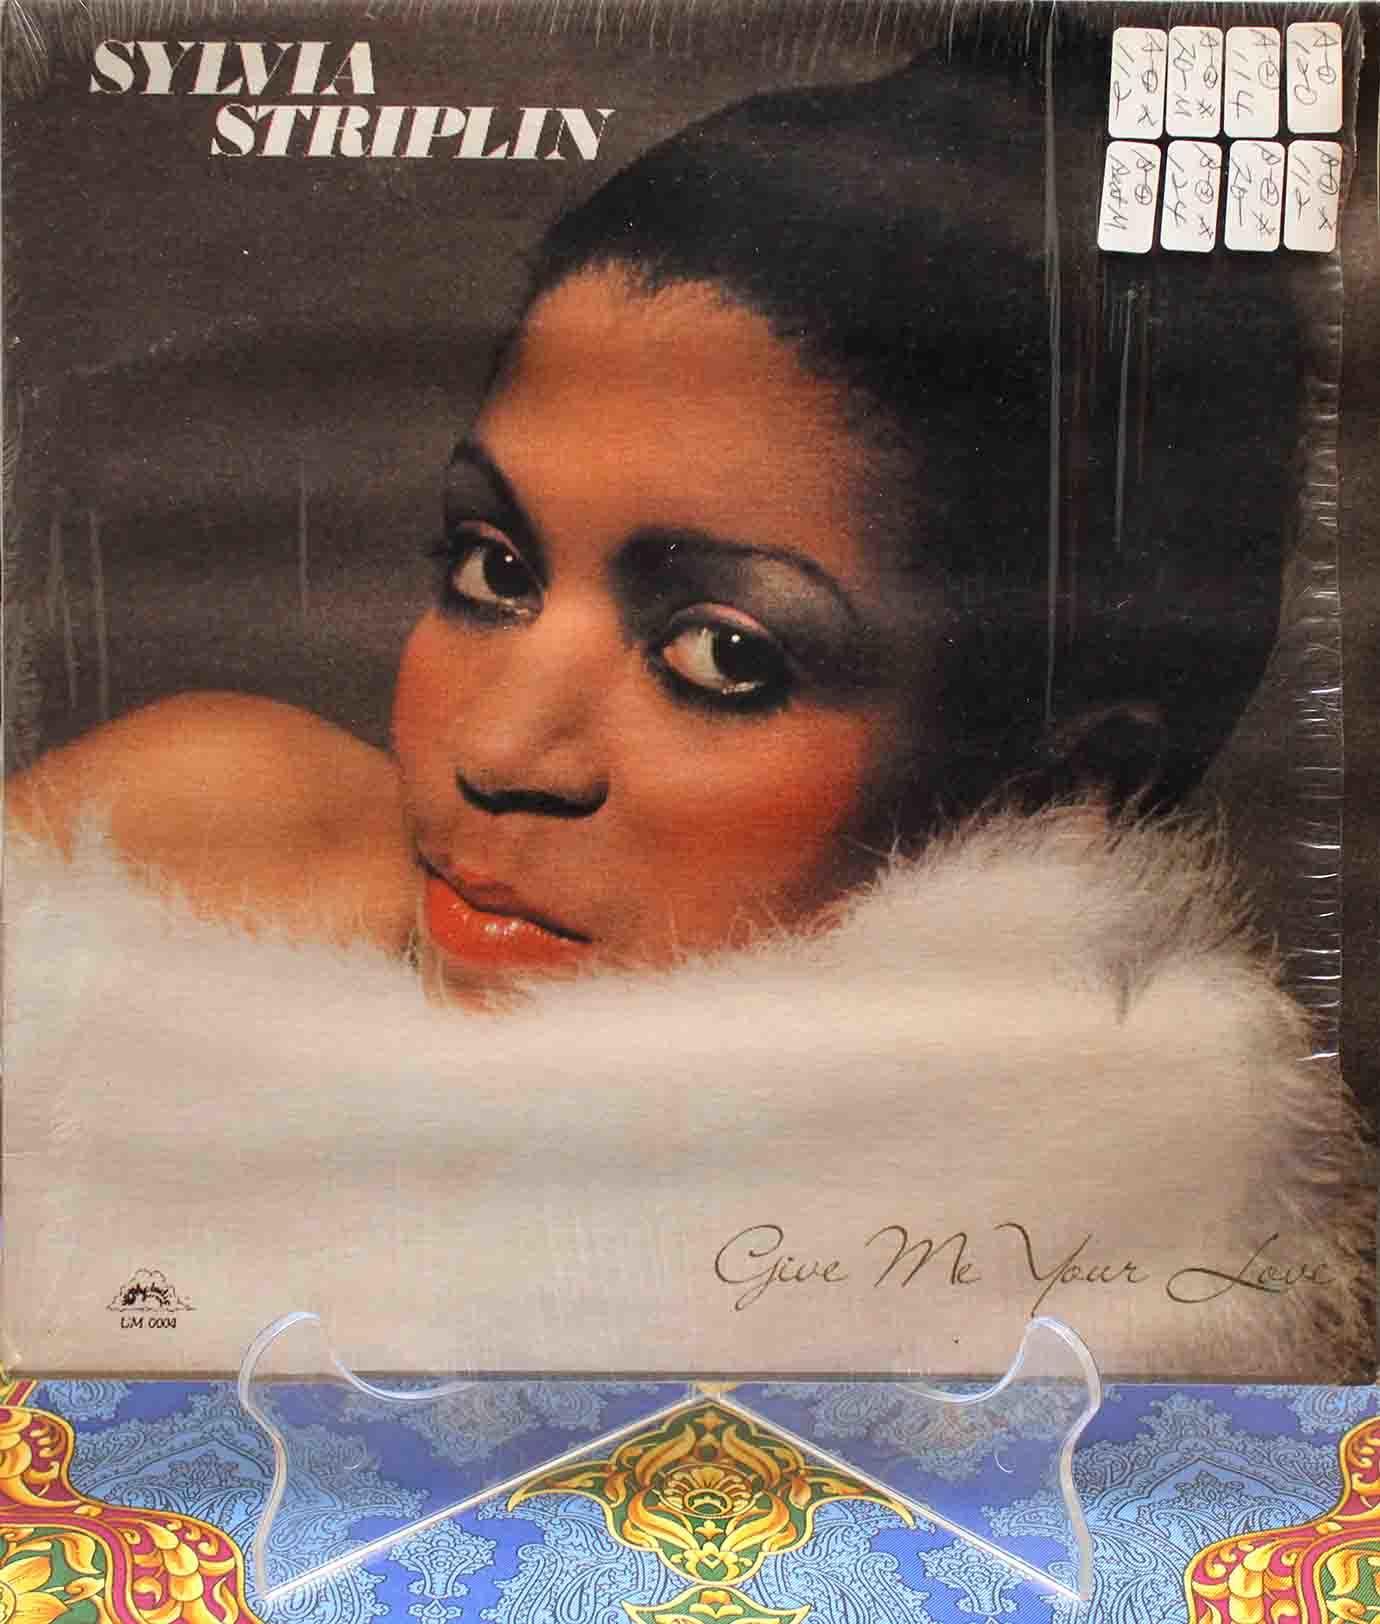 Sylvia Striplin – Give Me Your Love LP01